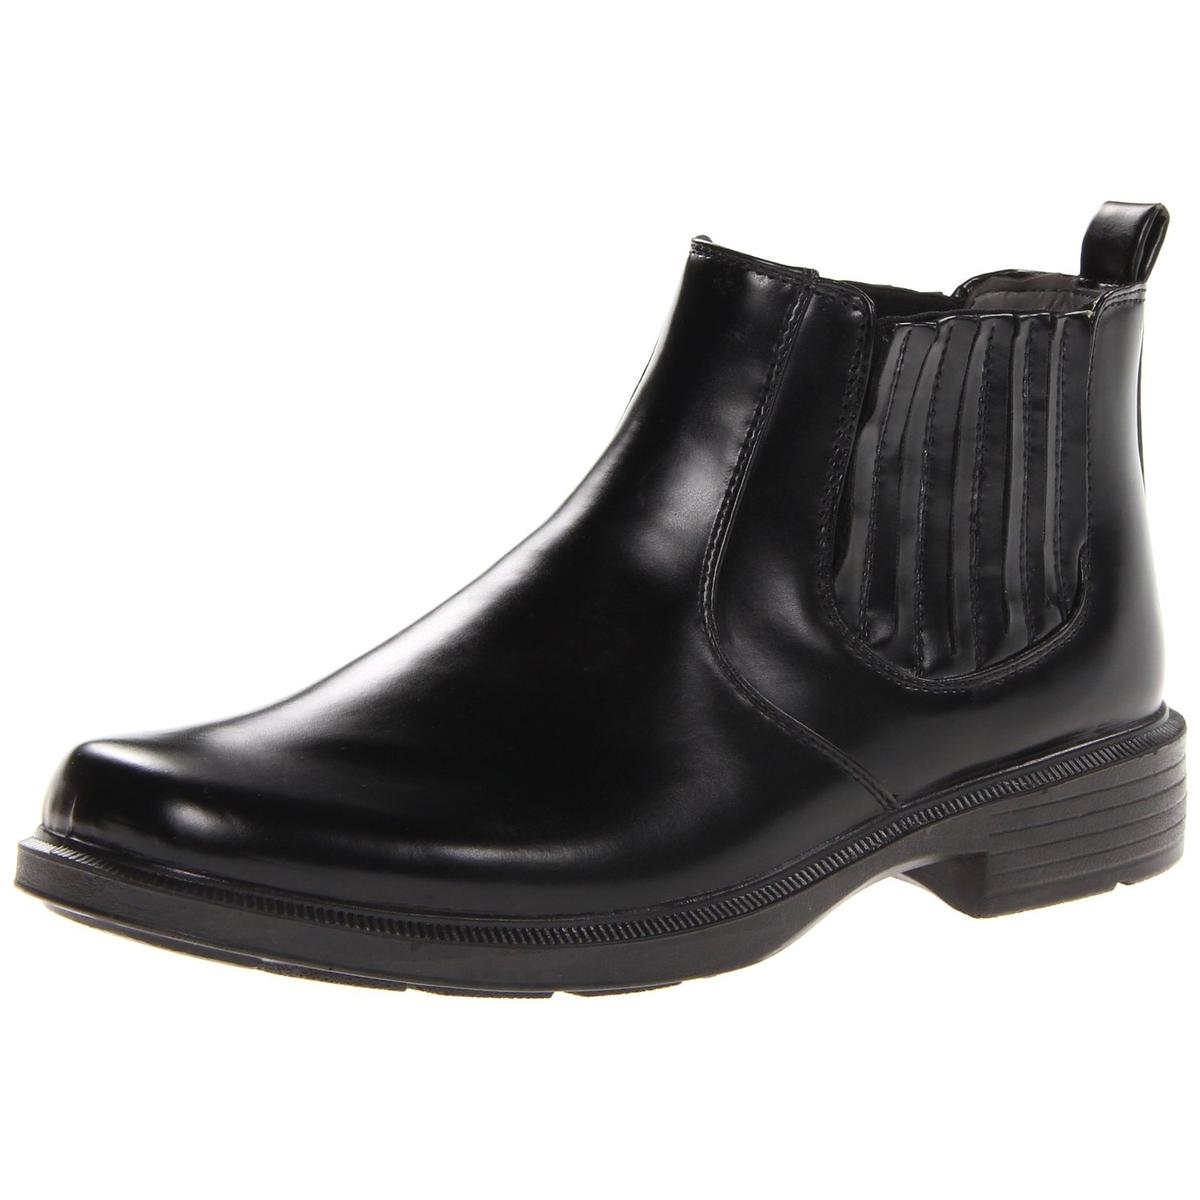 Click here to buy Deer Stags Hoffman Mens Black Boots by Deer Stags.